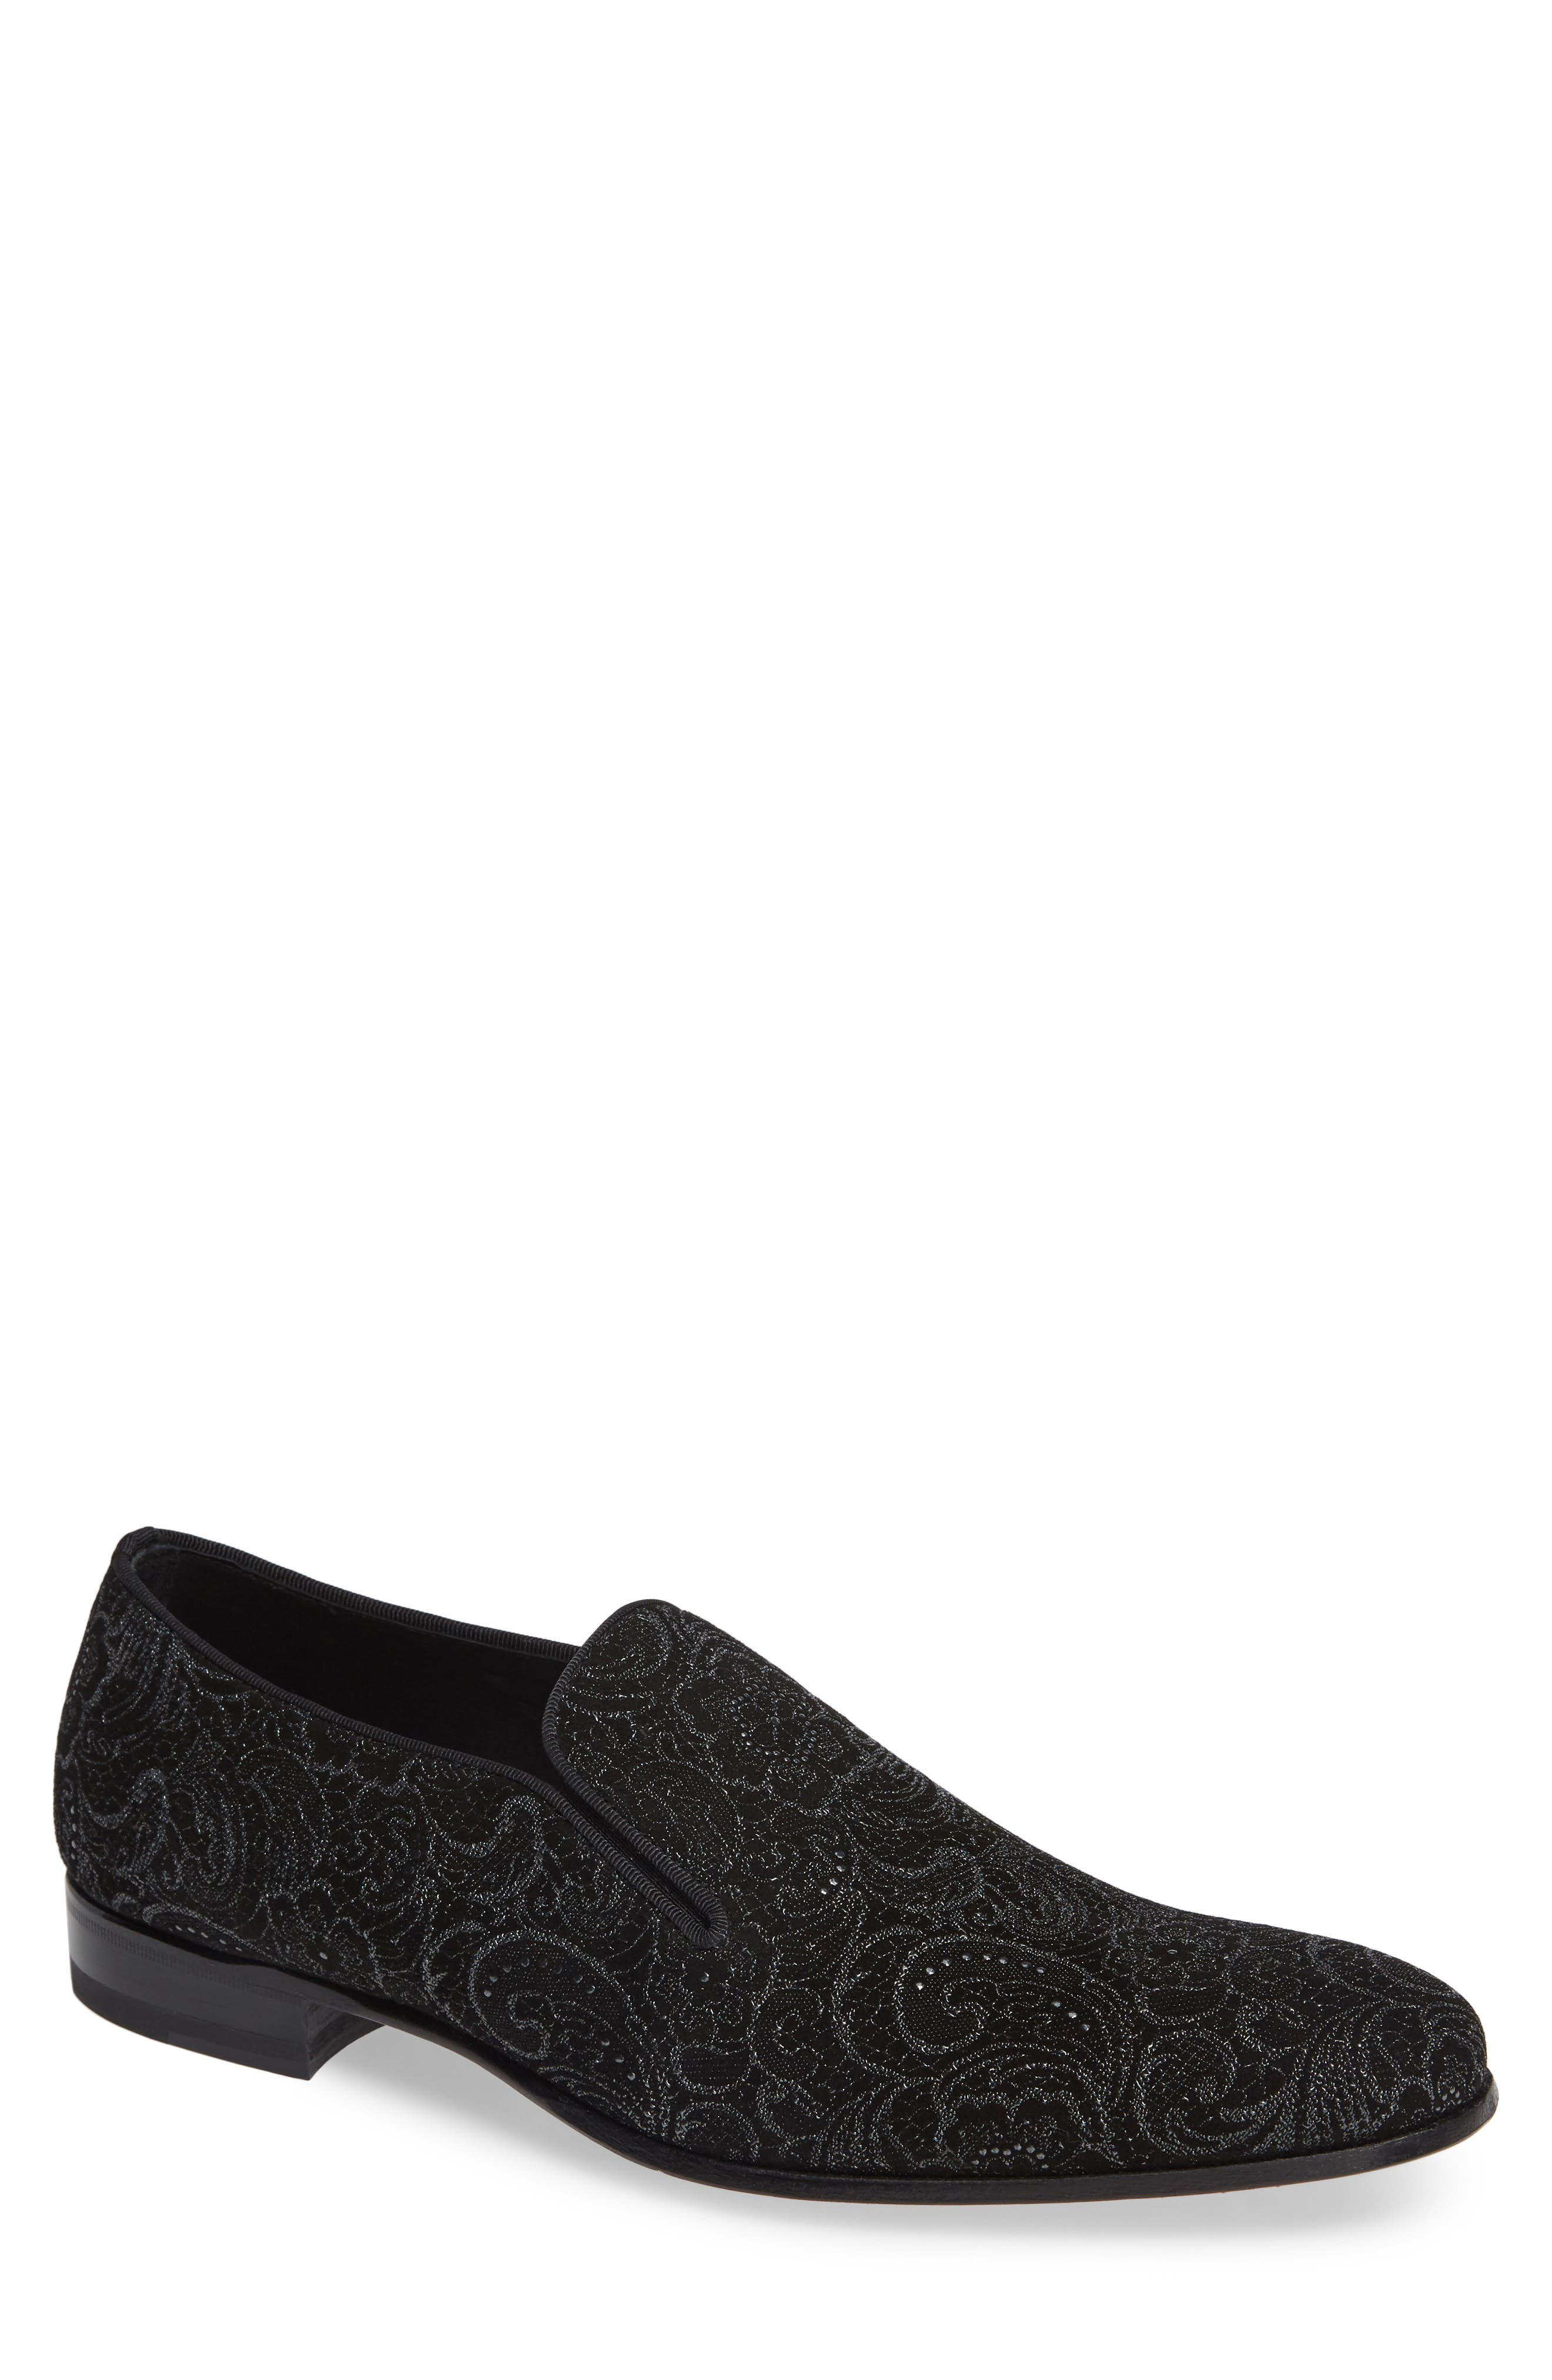 Damon Venetian Loafer,                         Main,                         color, BLACK FABRIC